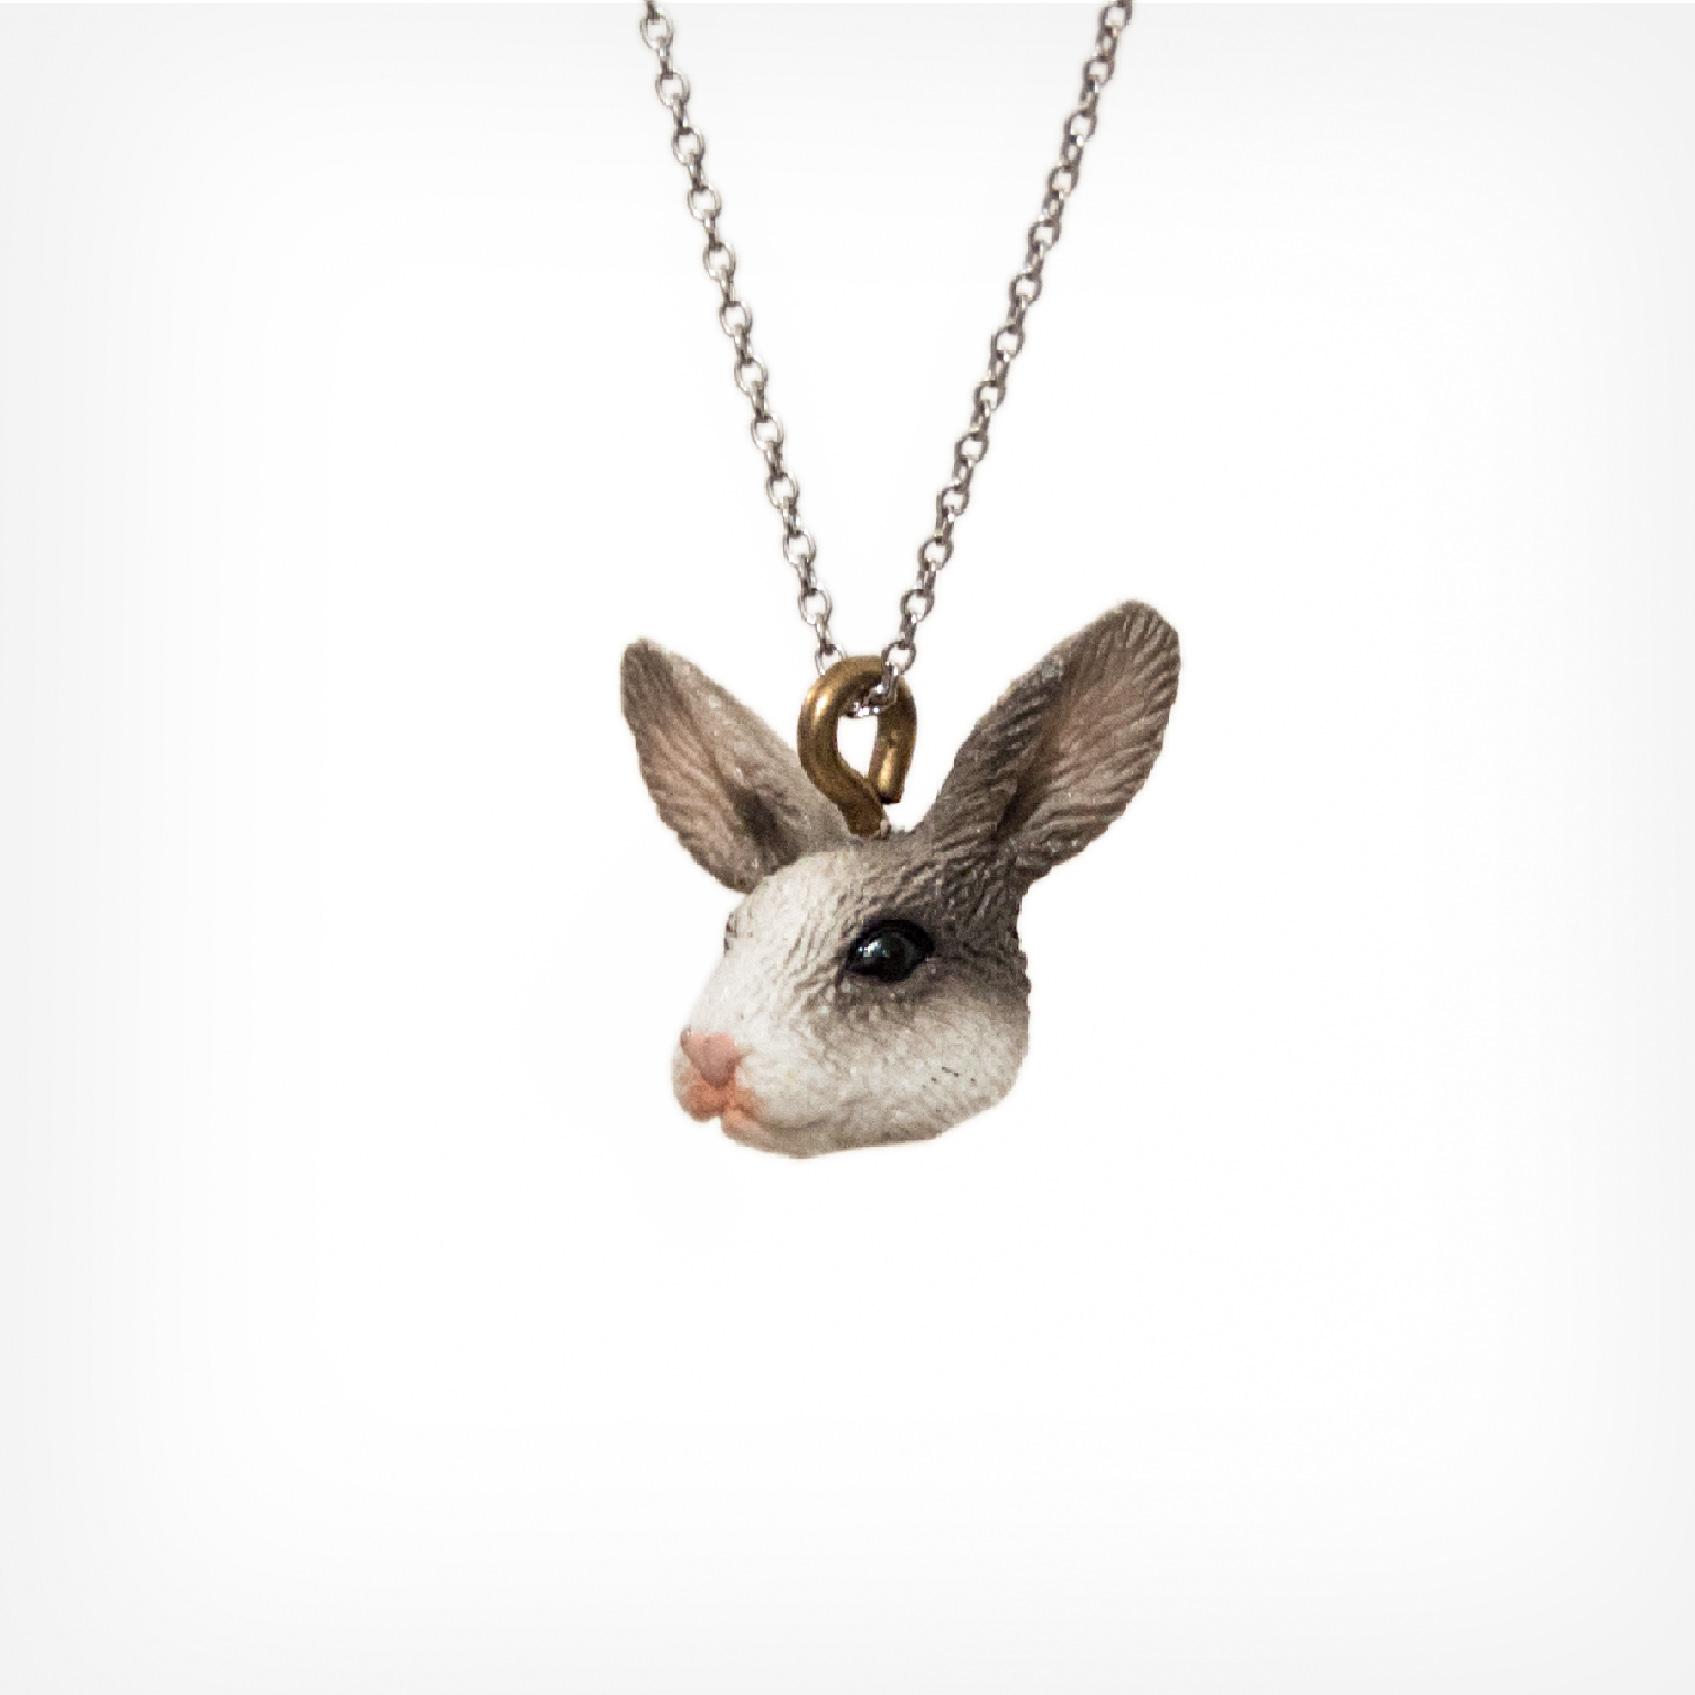 Kaninchen | rabbit